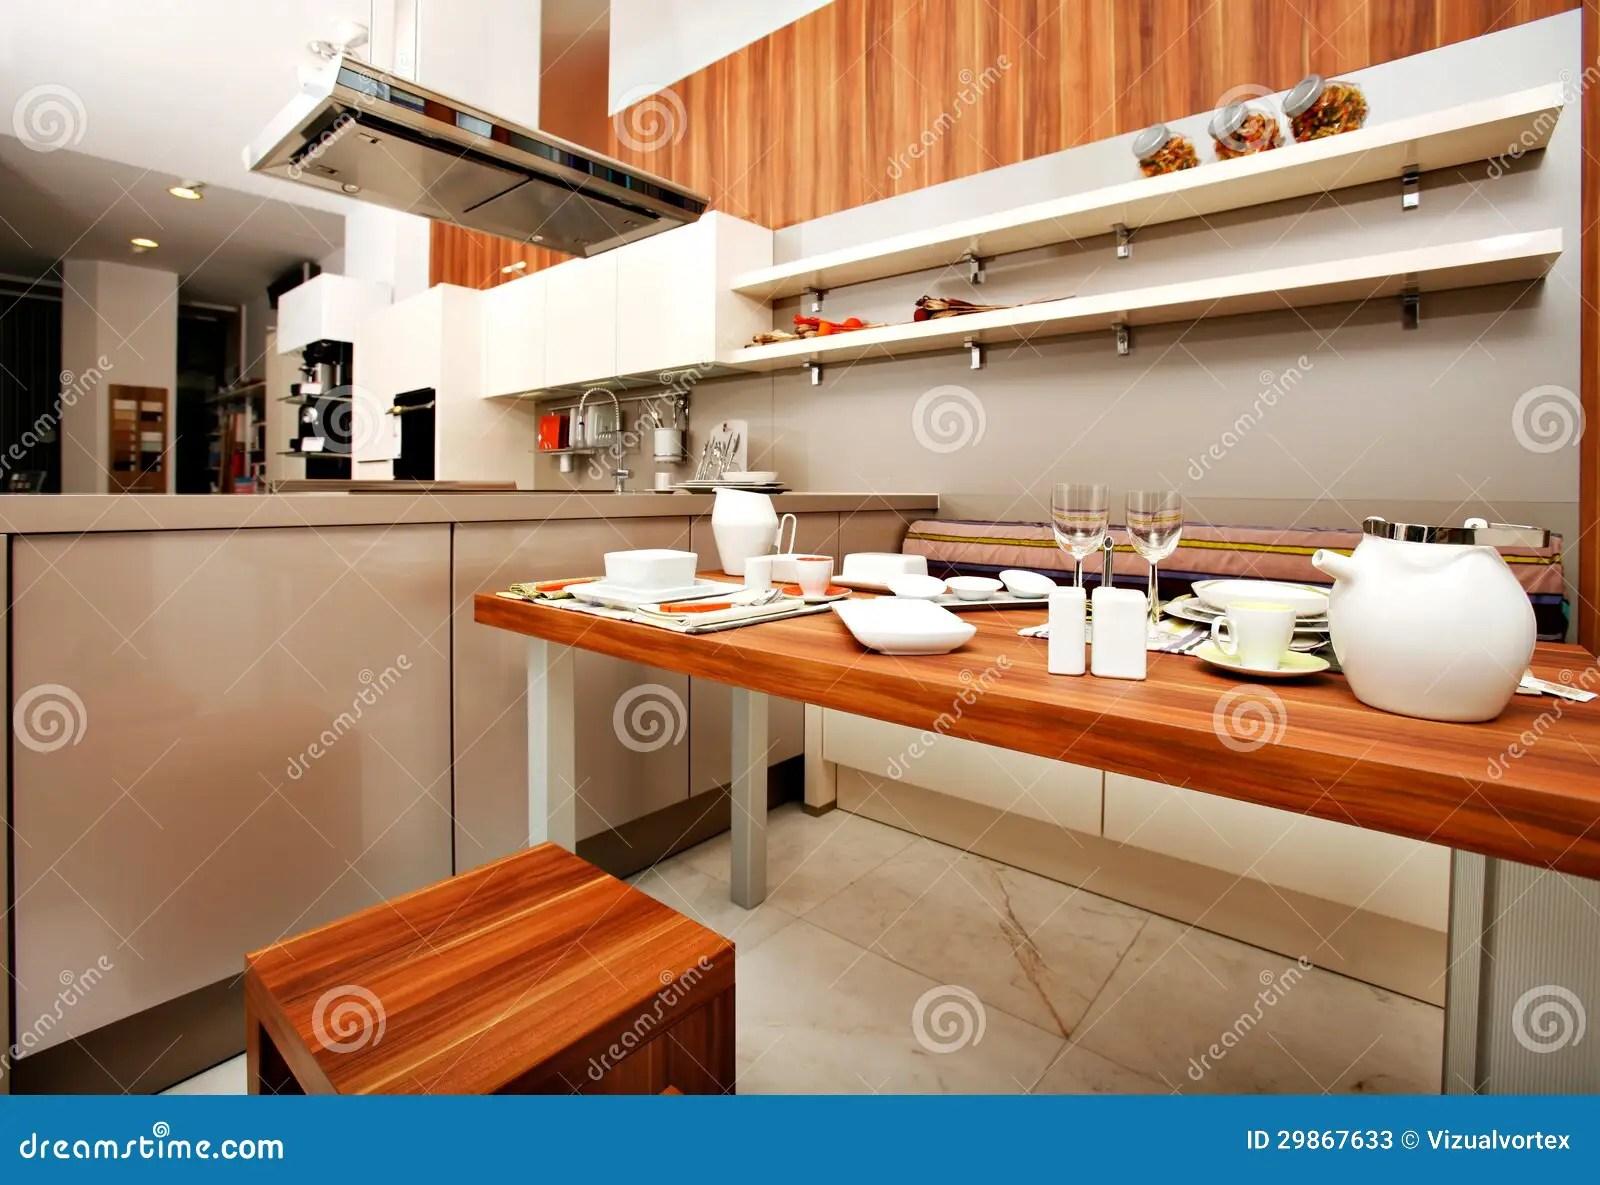 kitchen aid knives double sink 美丽的现代厨房库存图片 图片包括有巧妙 灌肠器 组织 刀叉餐具 现代 包含家具 装置和辅助部件的现代厨房设计